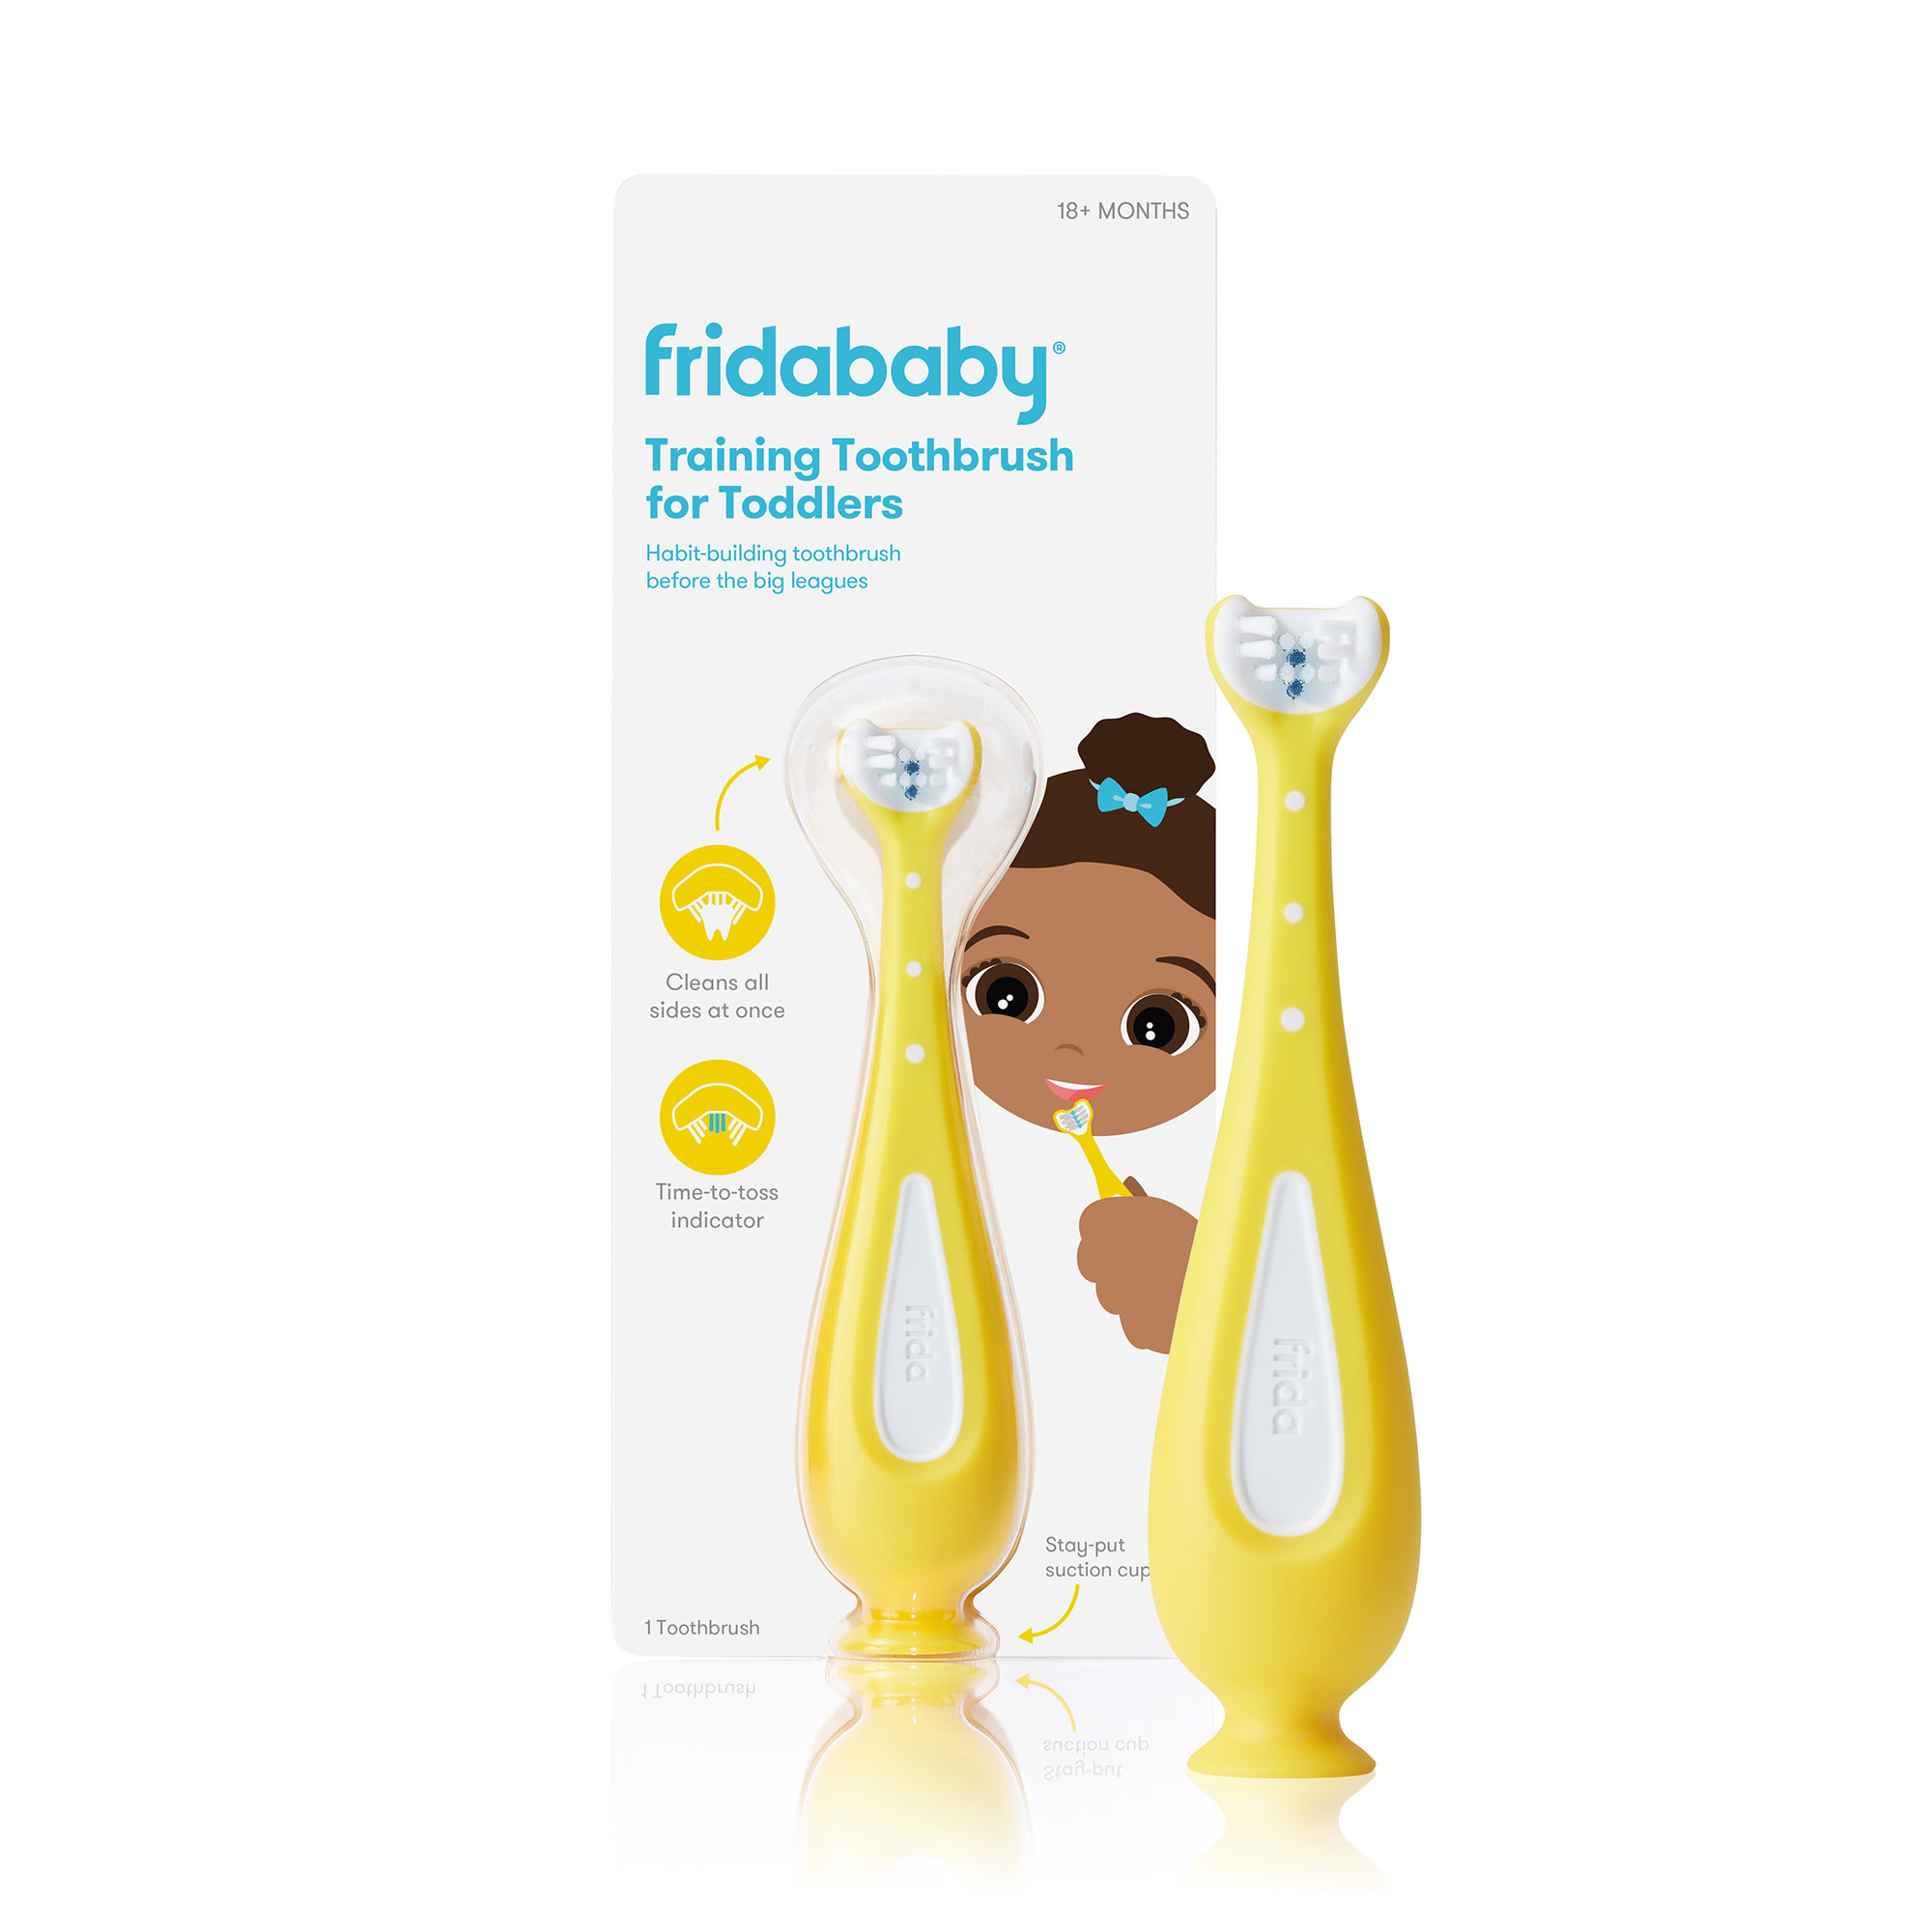 Fridababy Training Toothbrush - Toddler